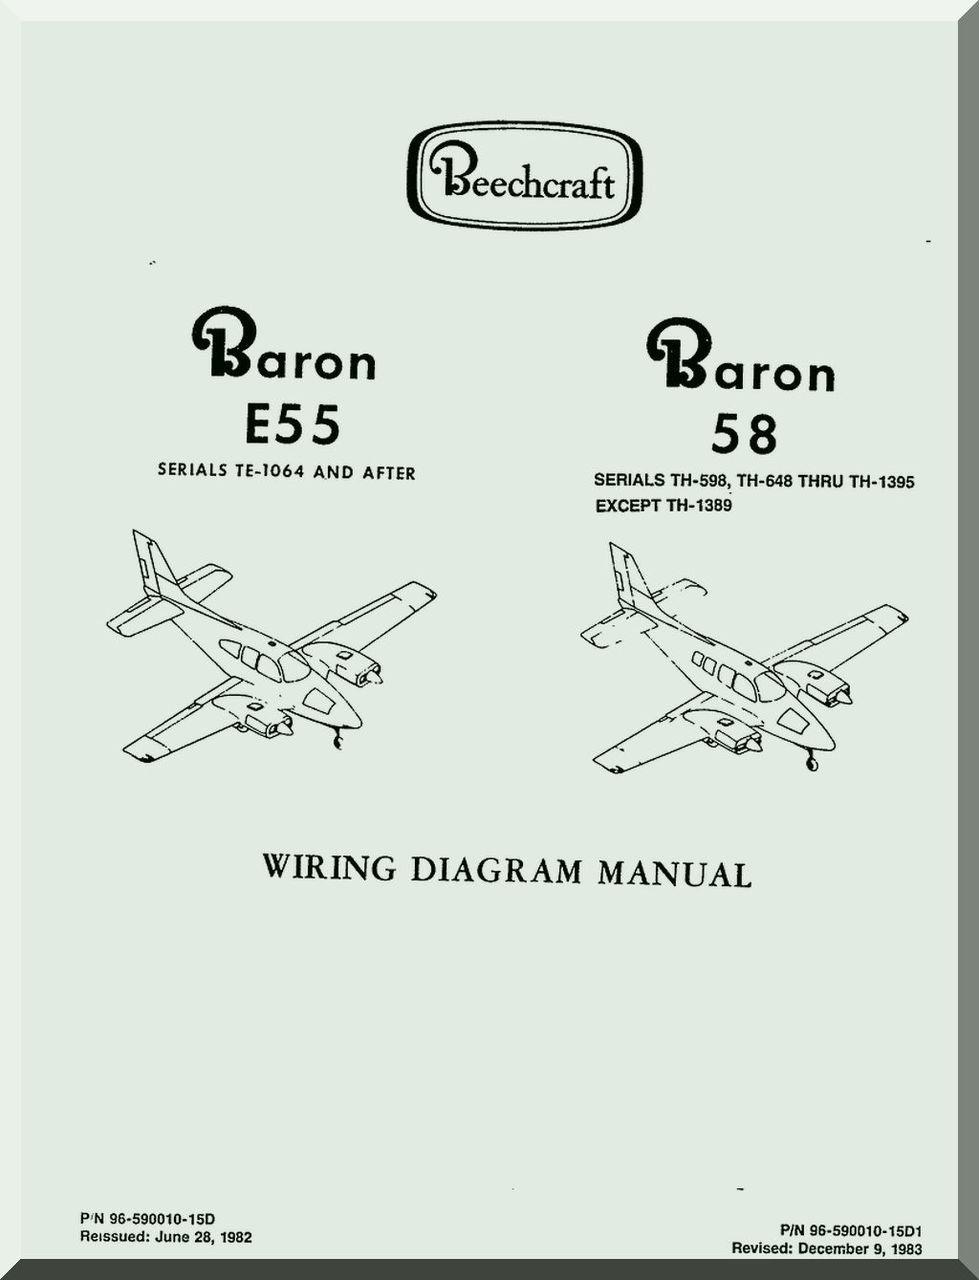 wiring diagram manual aircraft beechcraft baron e 55 58 aircraft wiring diagram manual  [ 979 x 1280 Pixel ]